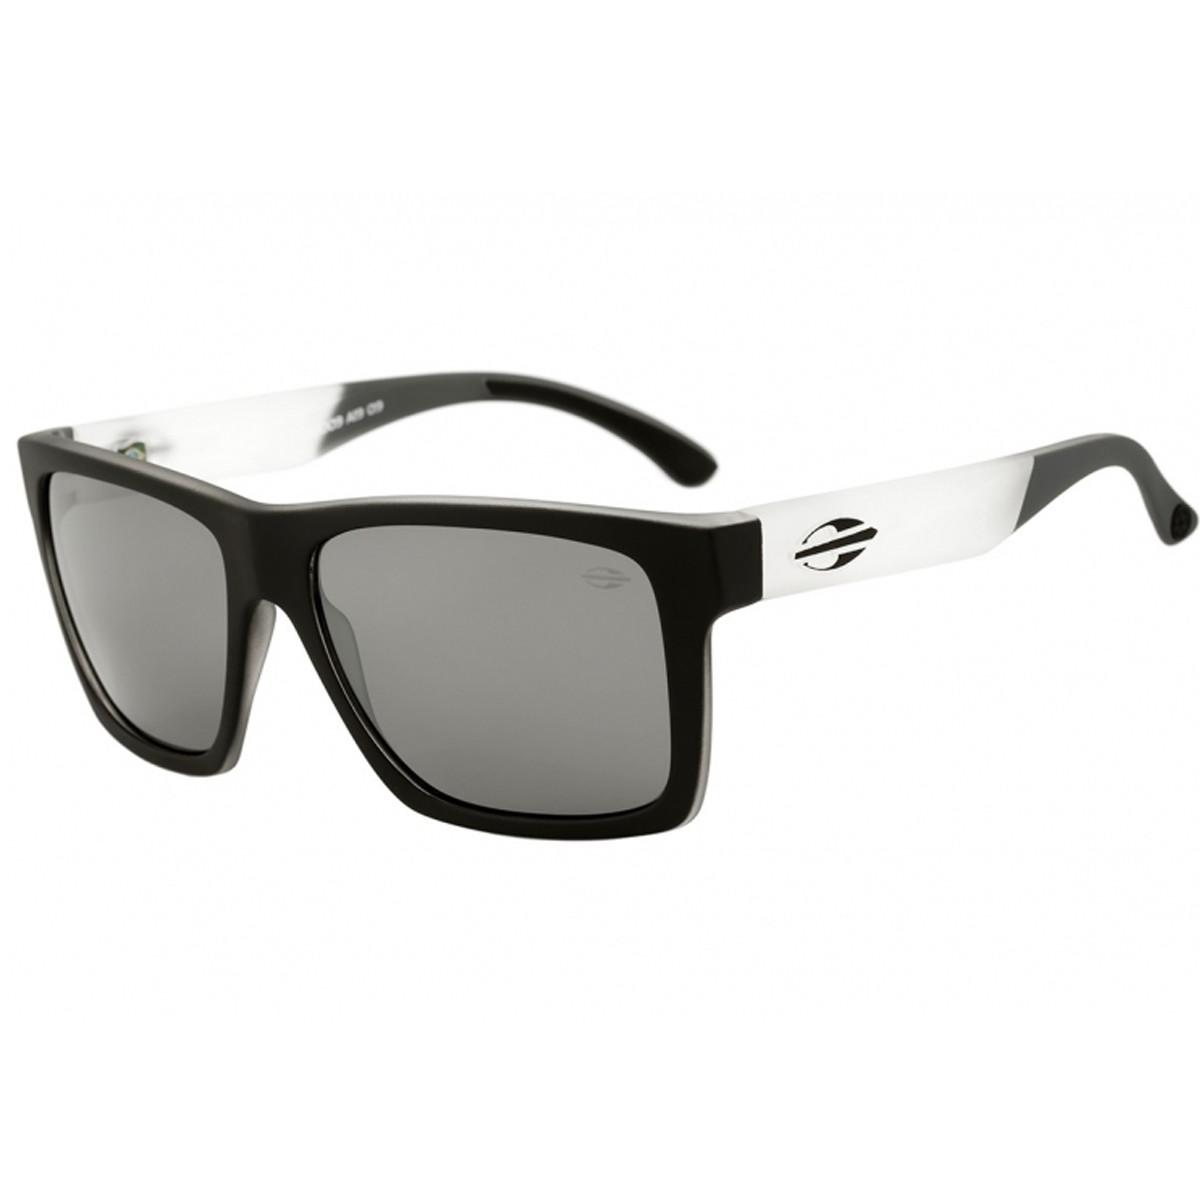 Óculos Mormaii San Diego Preto Fosco Lente cinza ref M0009A1909 77f0d5a9a2